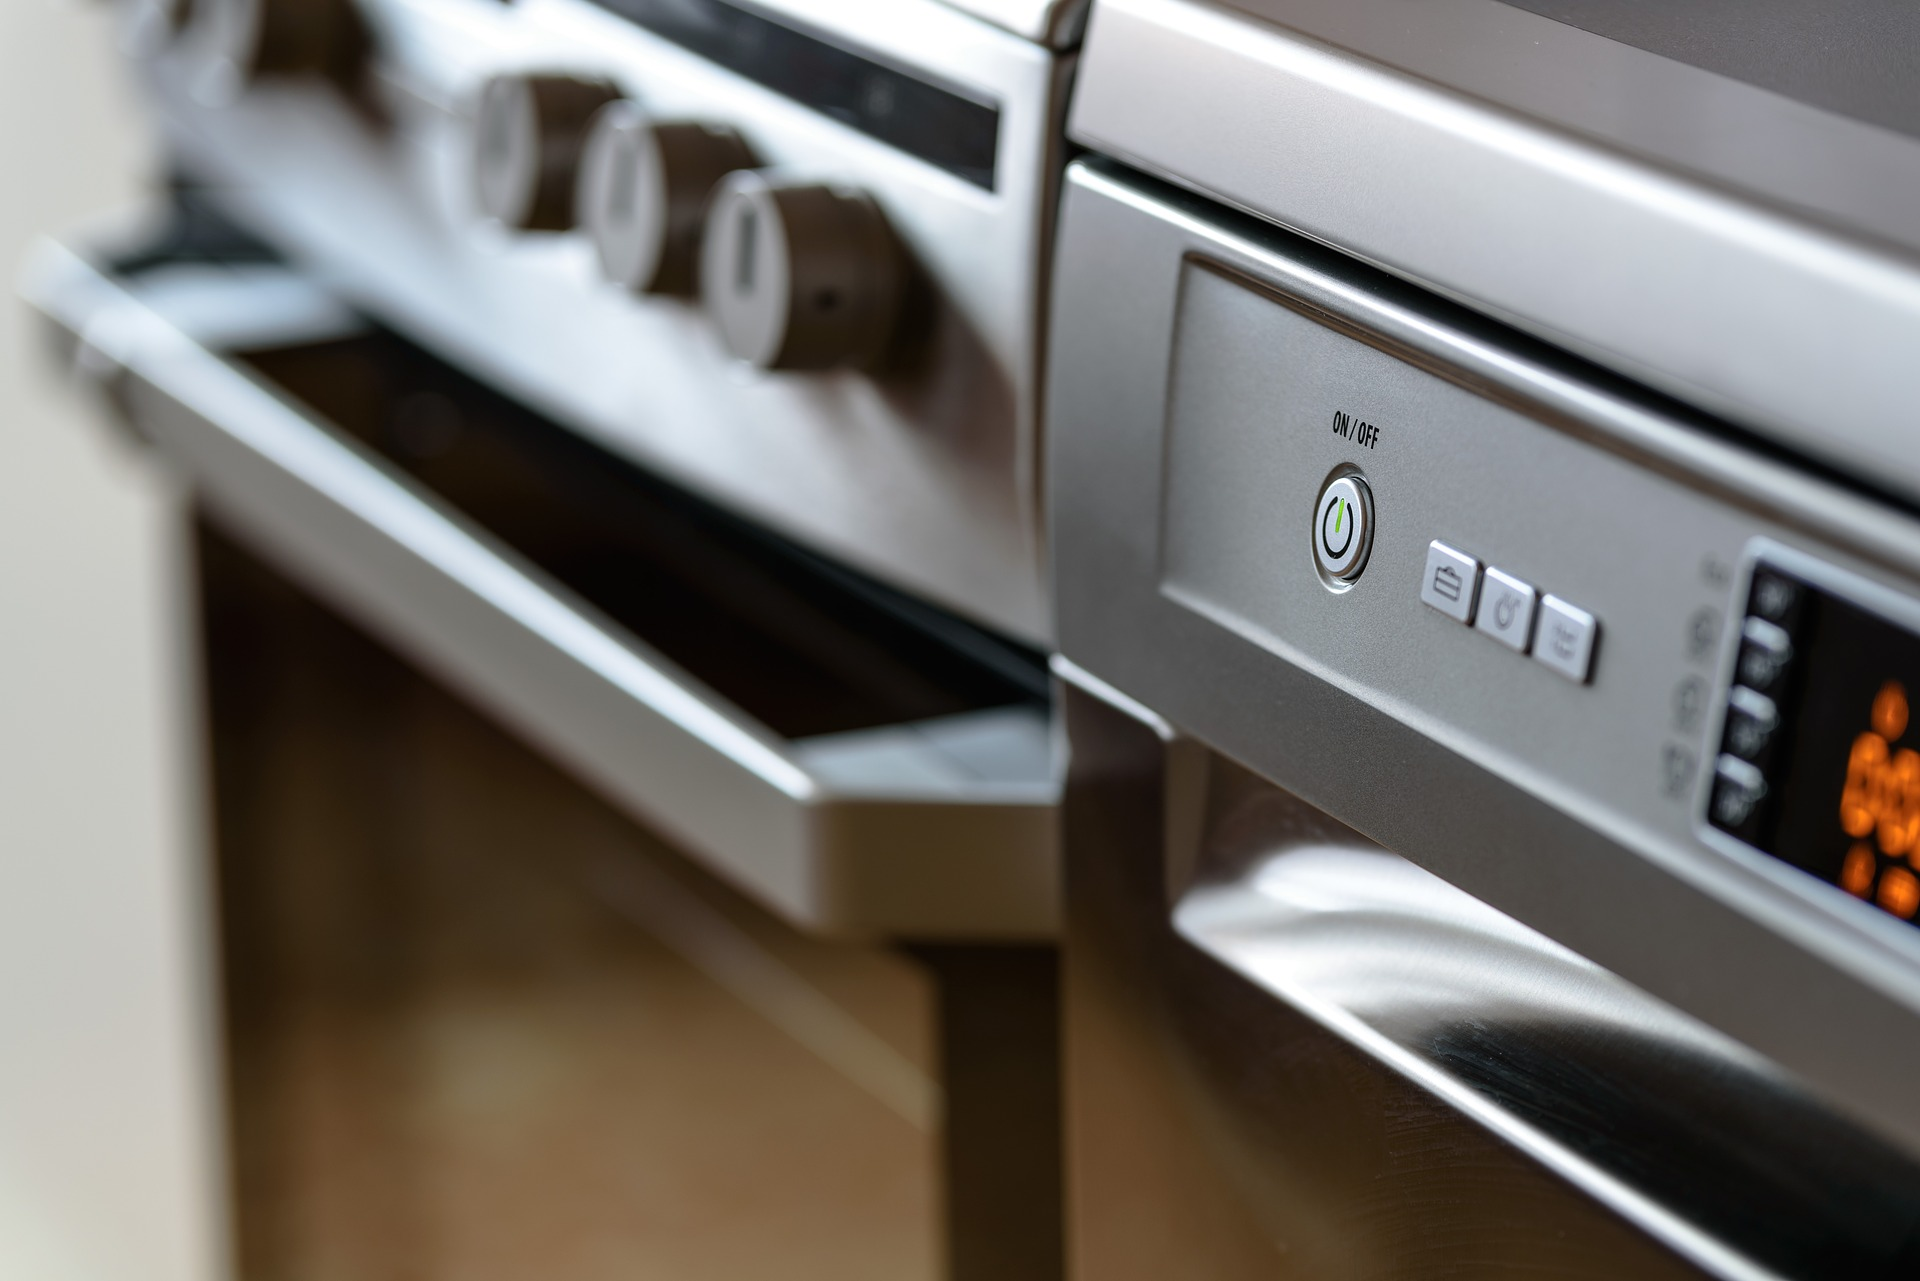 Moving heavy kitchen appliances